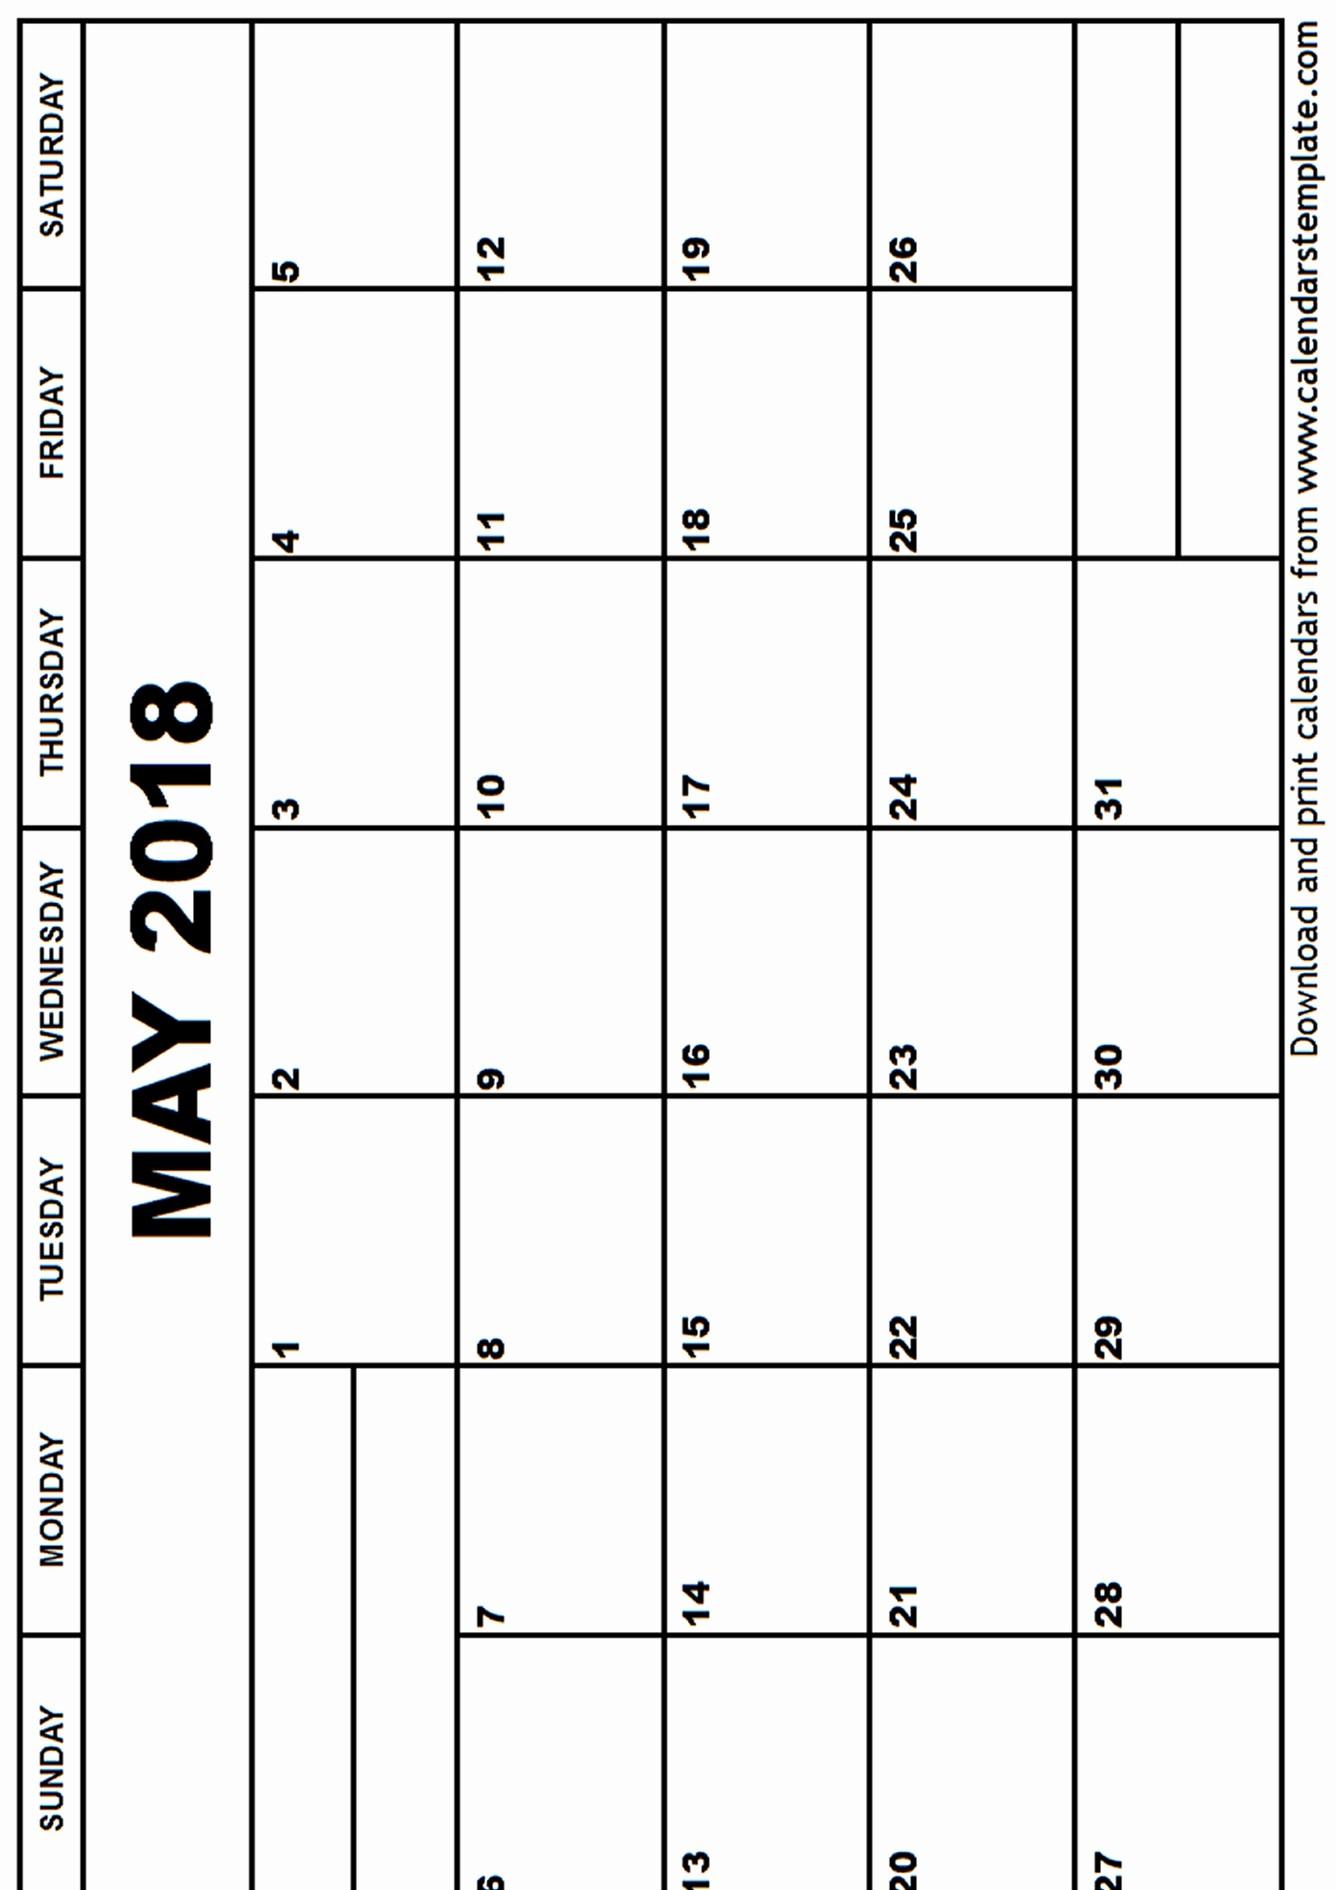 Free May 2018 Calendar Template New May 2018 Calendar Template